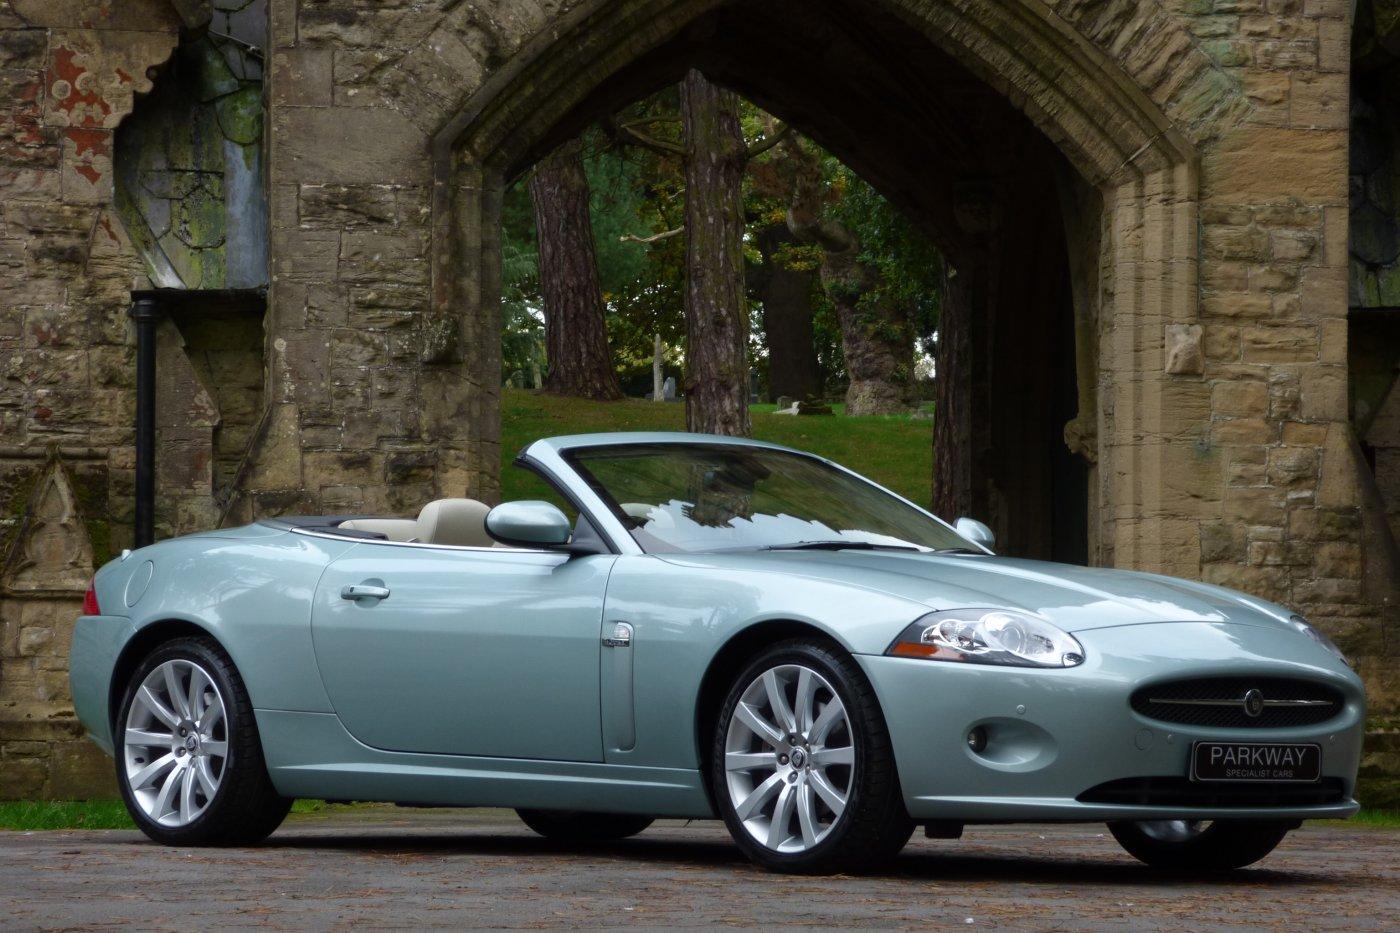 prestige for sale jaguar usedcfs auto cars convertible xk